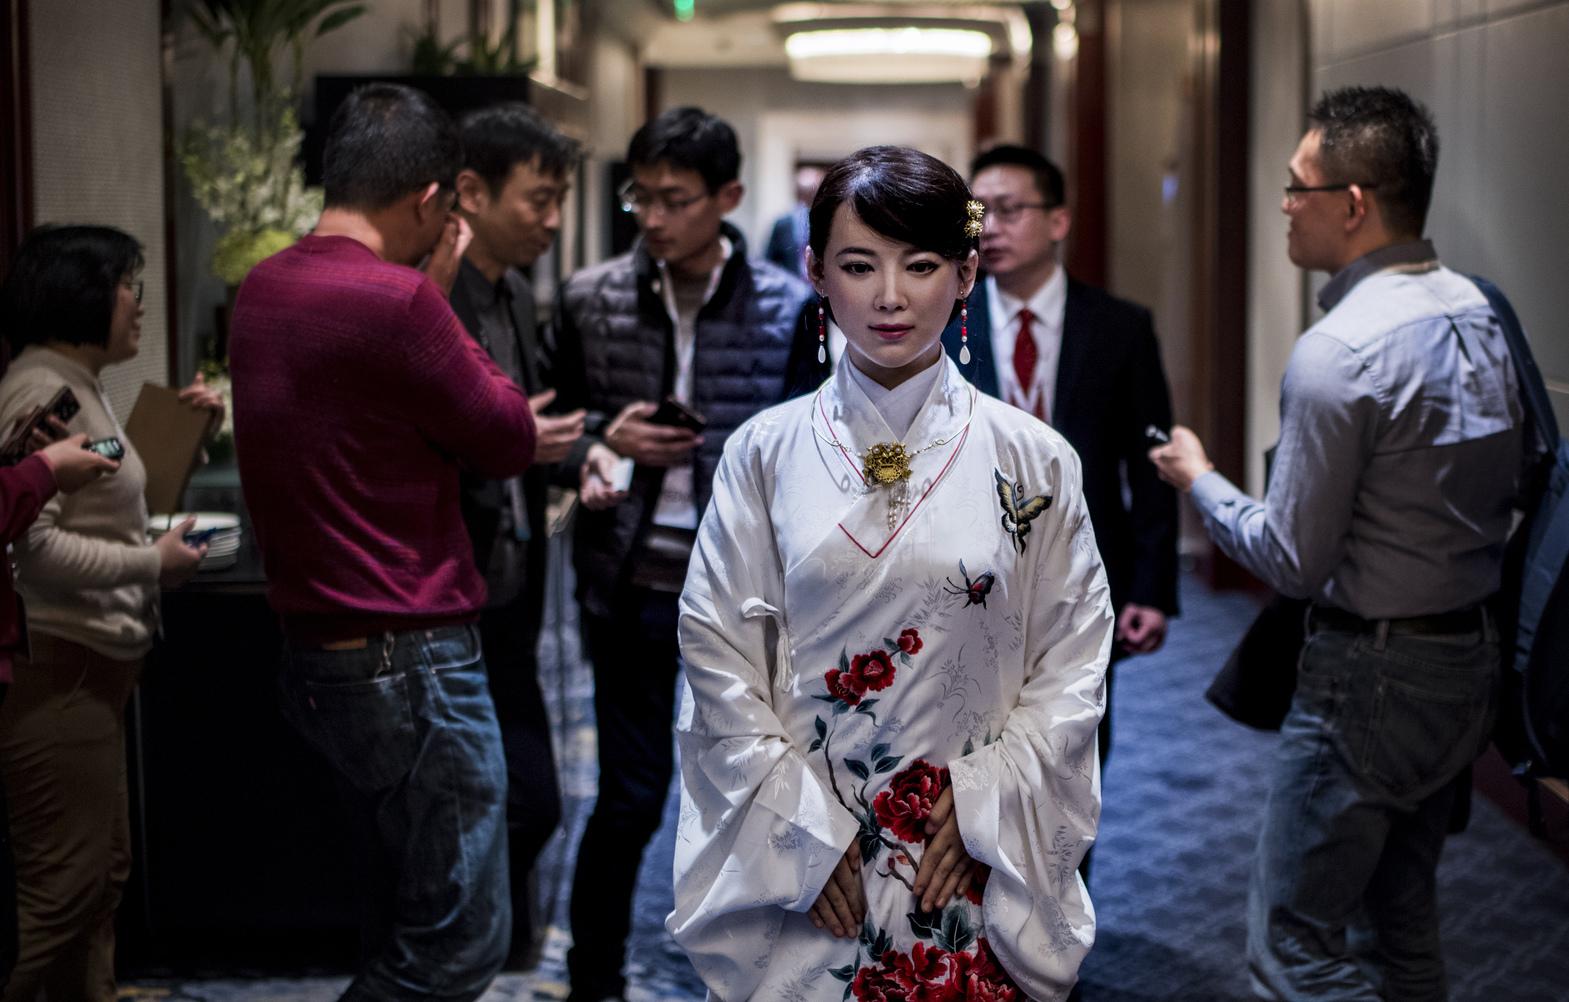 Csia Csia a sanghaji konferencián. (Fotó: AFP)